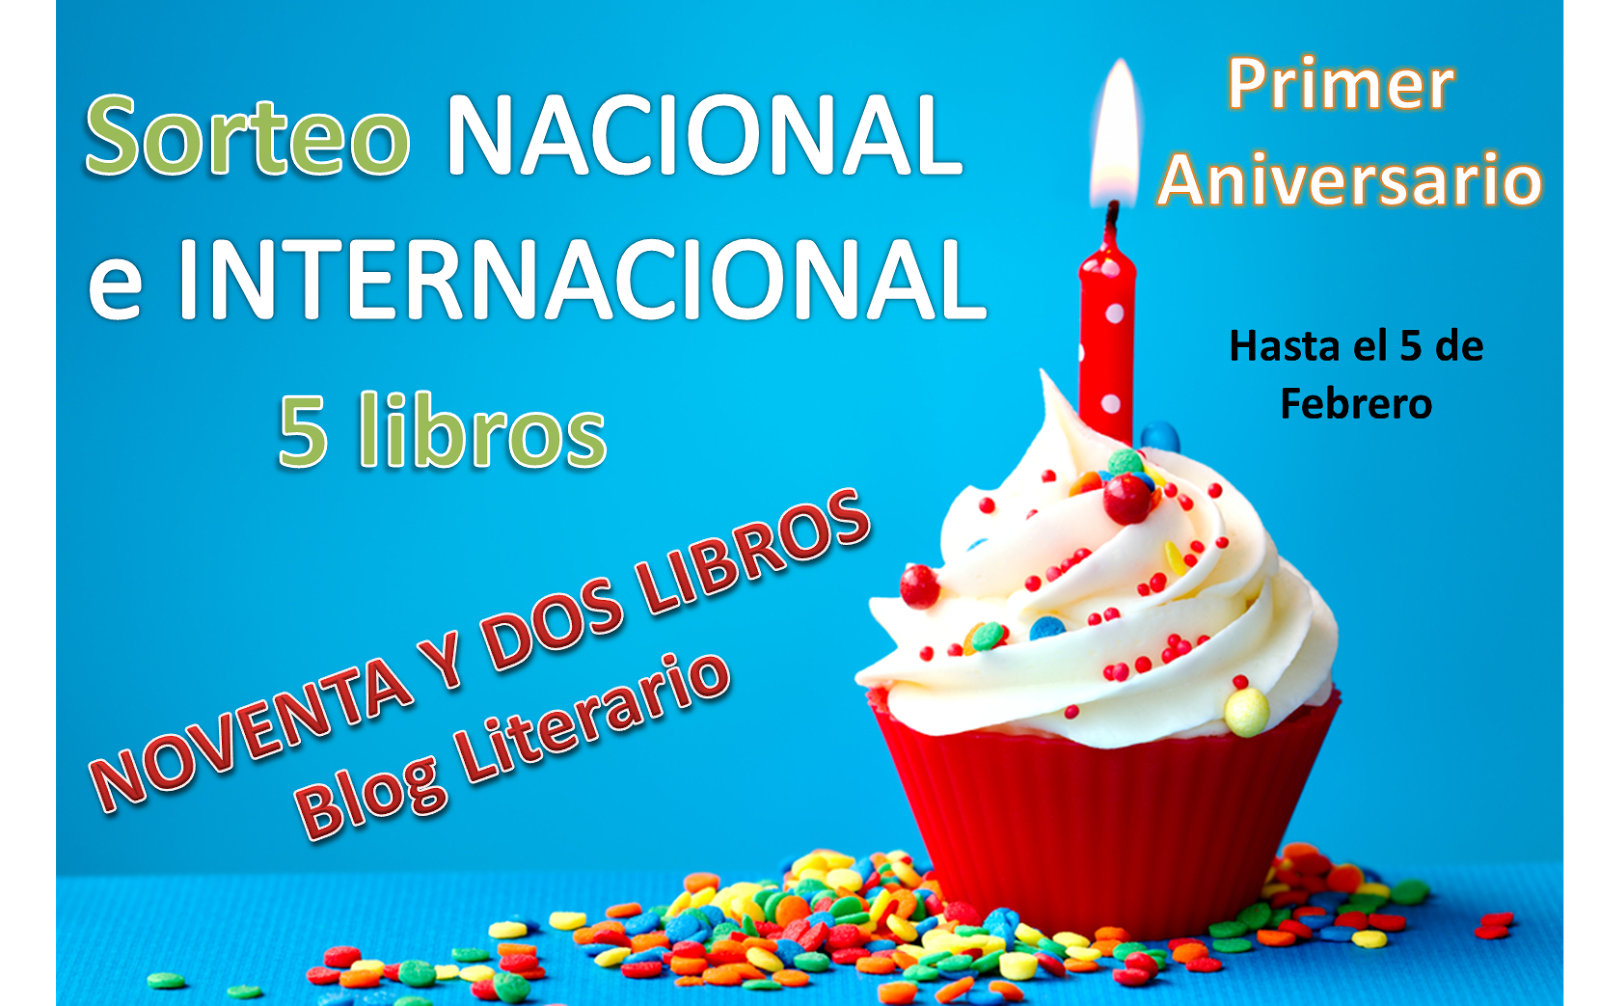 http://noventaydoslibros.blogspot.com.es/2015/01/sorteo-primer-aniversario-premios.html?showComment=1421447138226#c1179993139940440159